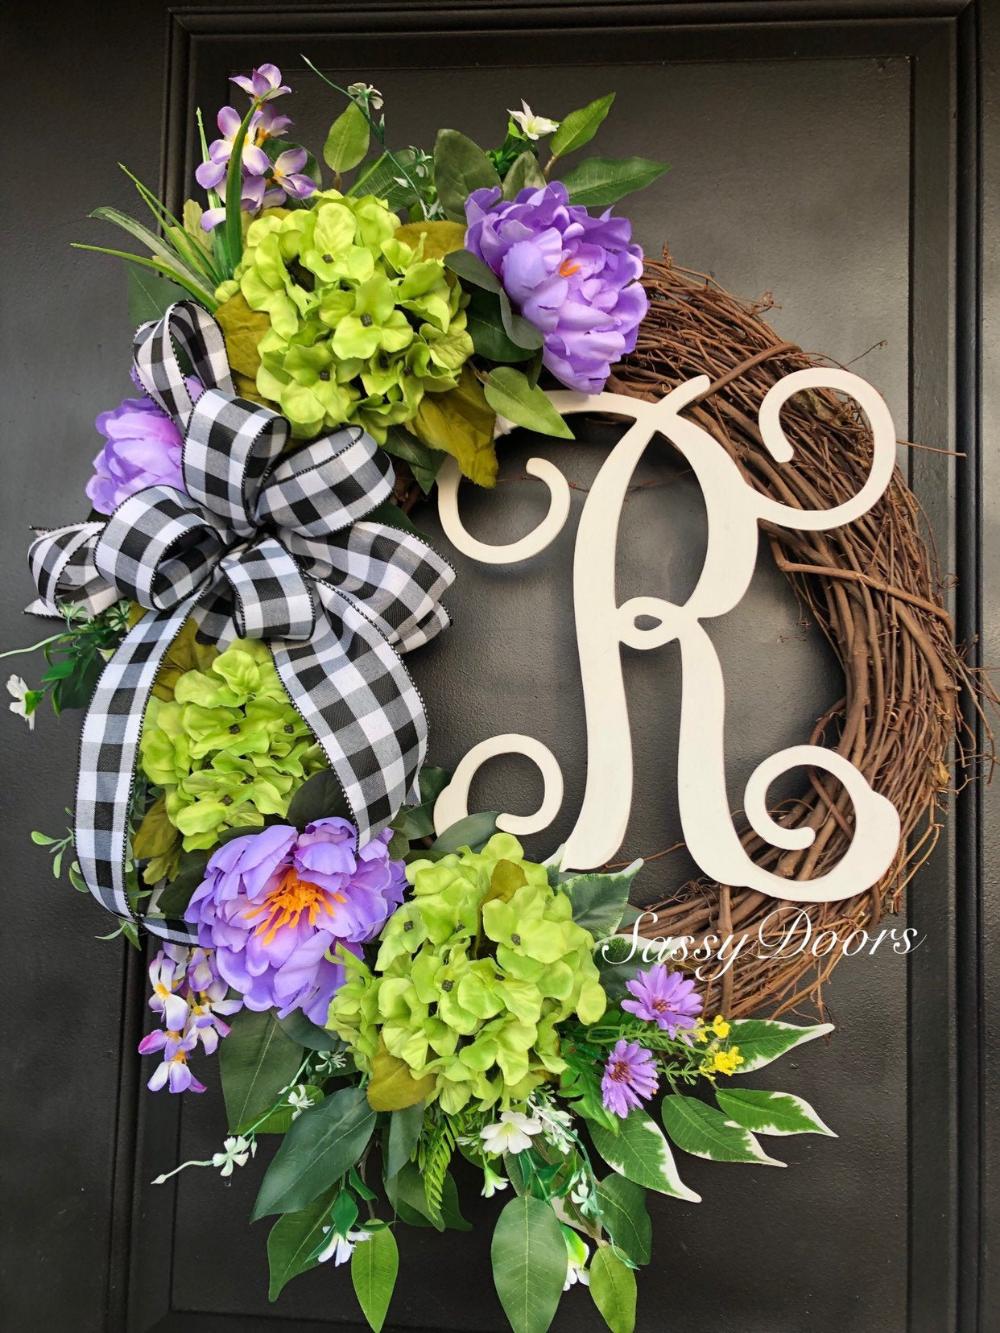 Front Door Wreath Initial Wreath Summer Wreath Monogram Wreath Purple Wreath Hydrangea Wreath Spring Letter Wreath Everyday Wreath